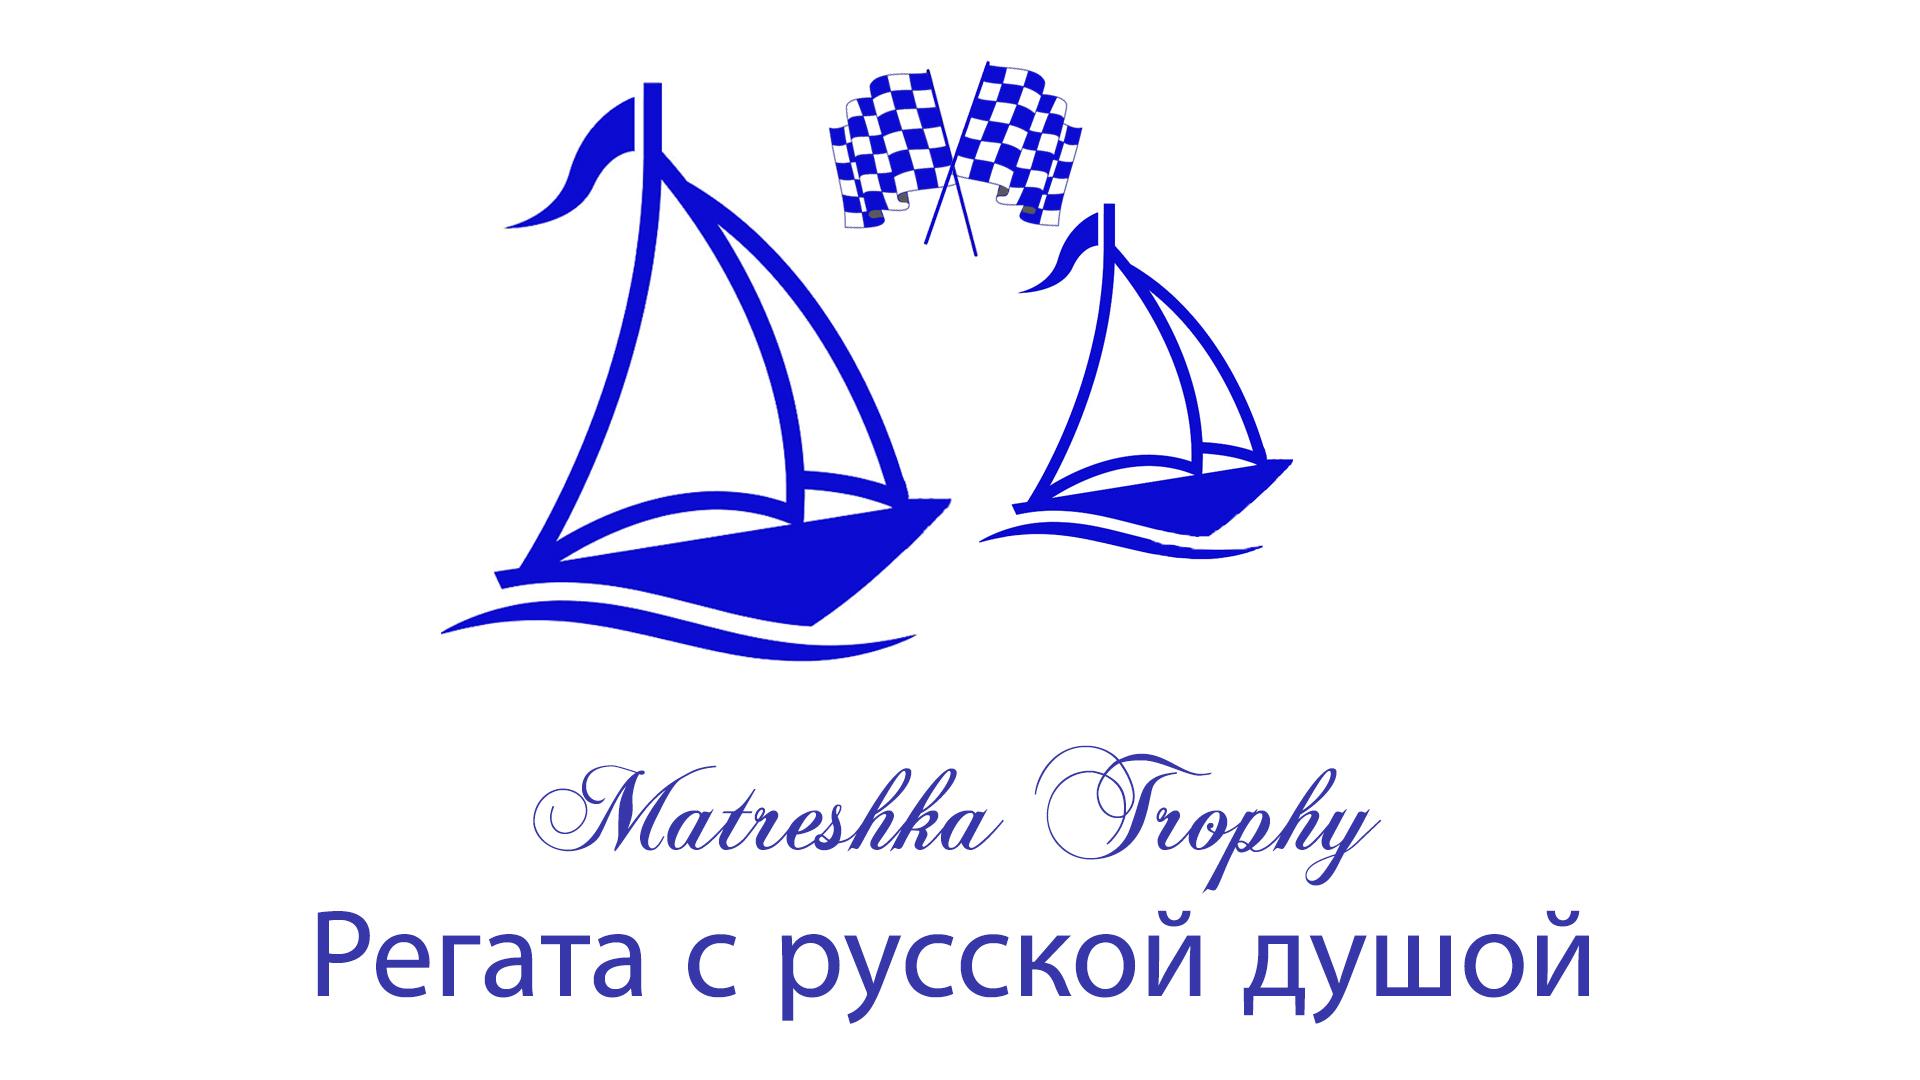 Логотип парусной регаты фото f_8725a302ee85e601.jpg